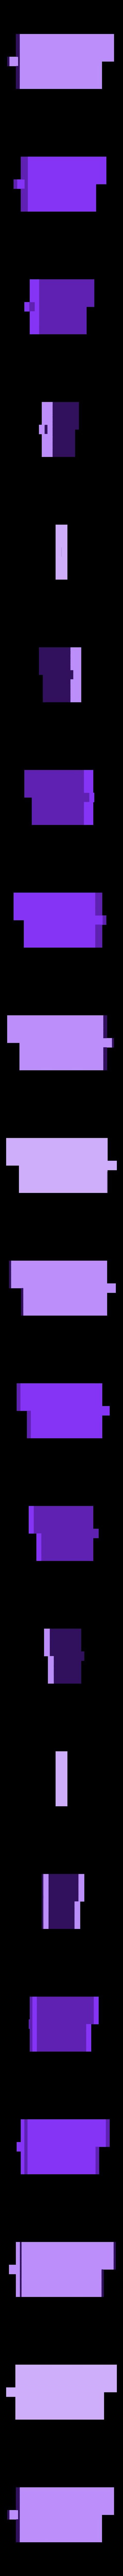 2017_04_20_08_21_36.stl Download free STL file Stop essence / fuel • 3D print object, rom182